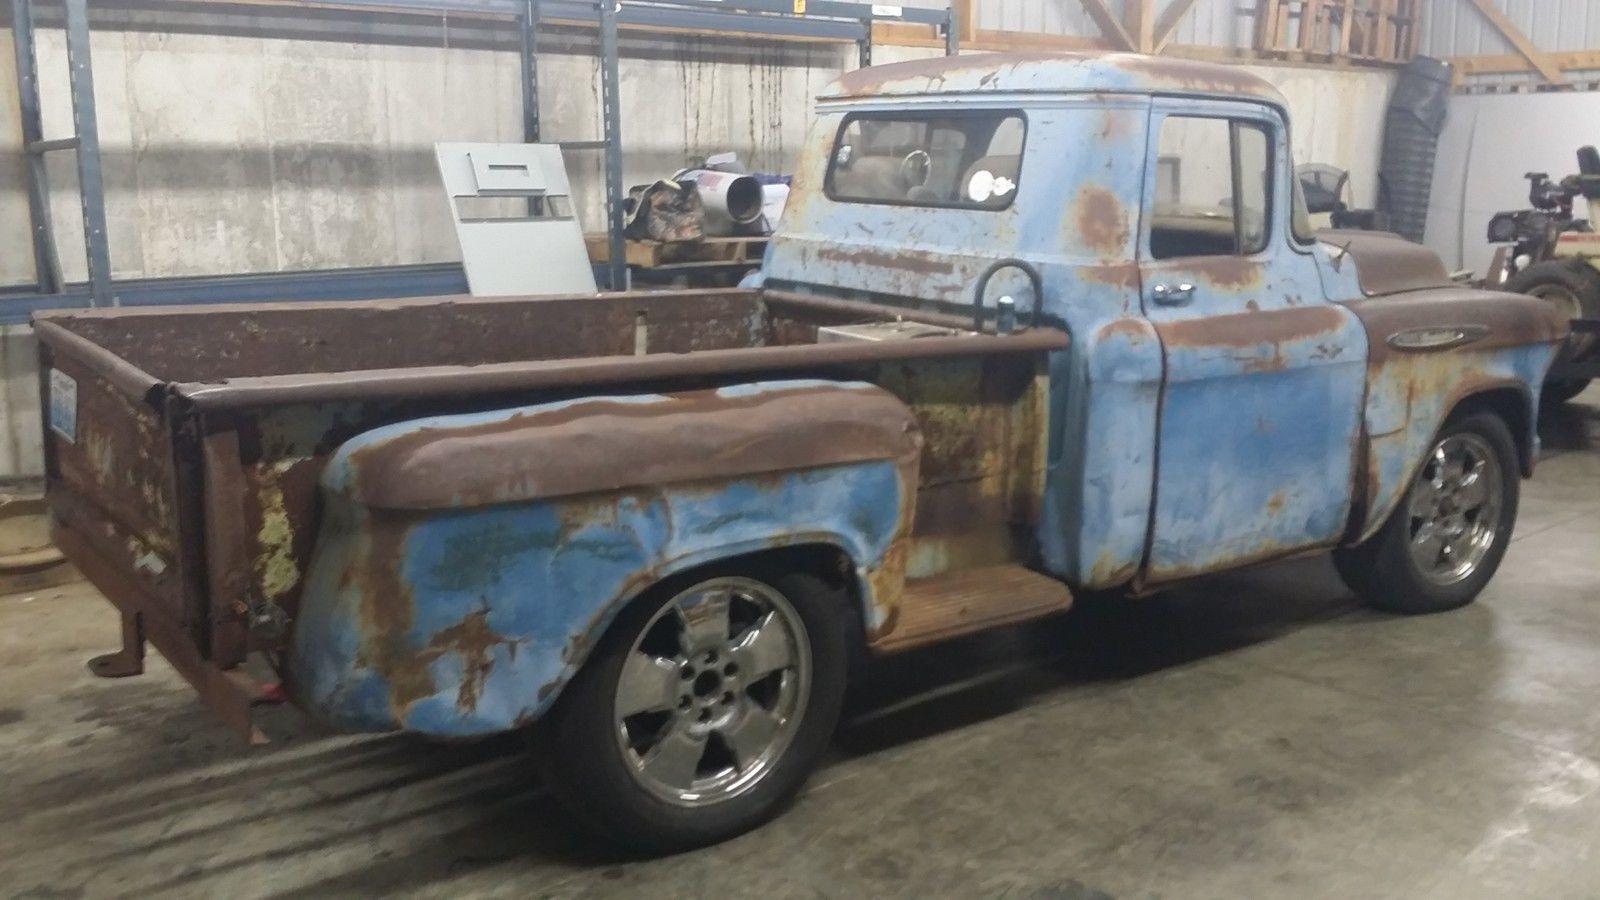 1957 Chevrolet Pickup Truck Ratrod Hotrod Project No Reserve Hot Rod